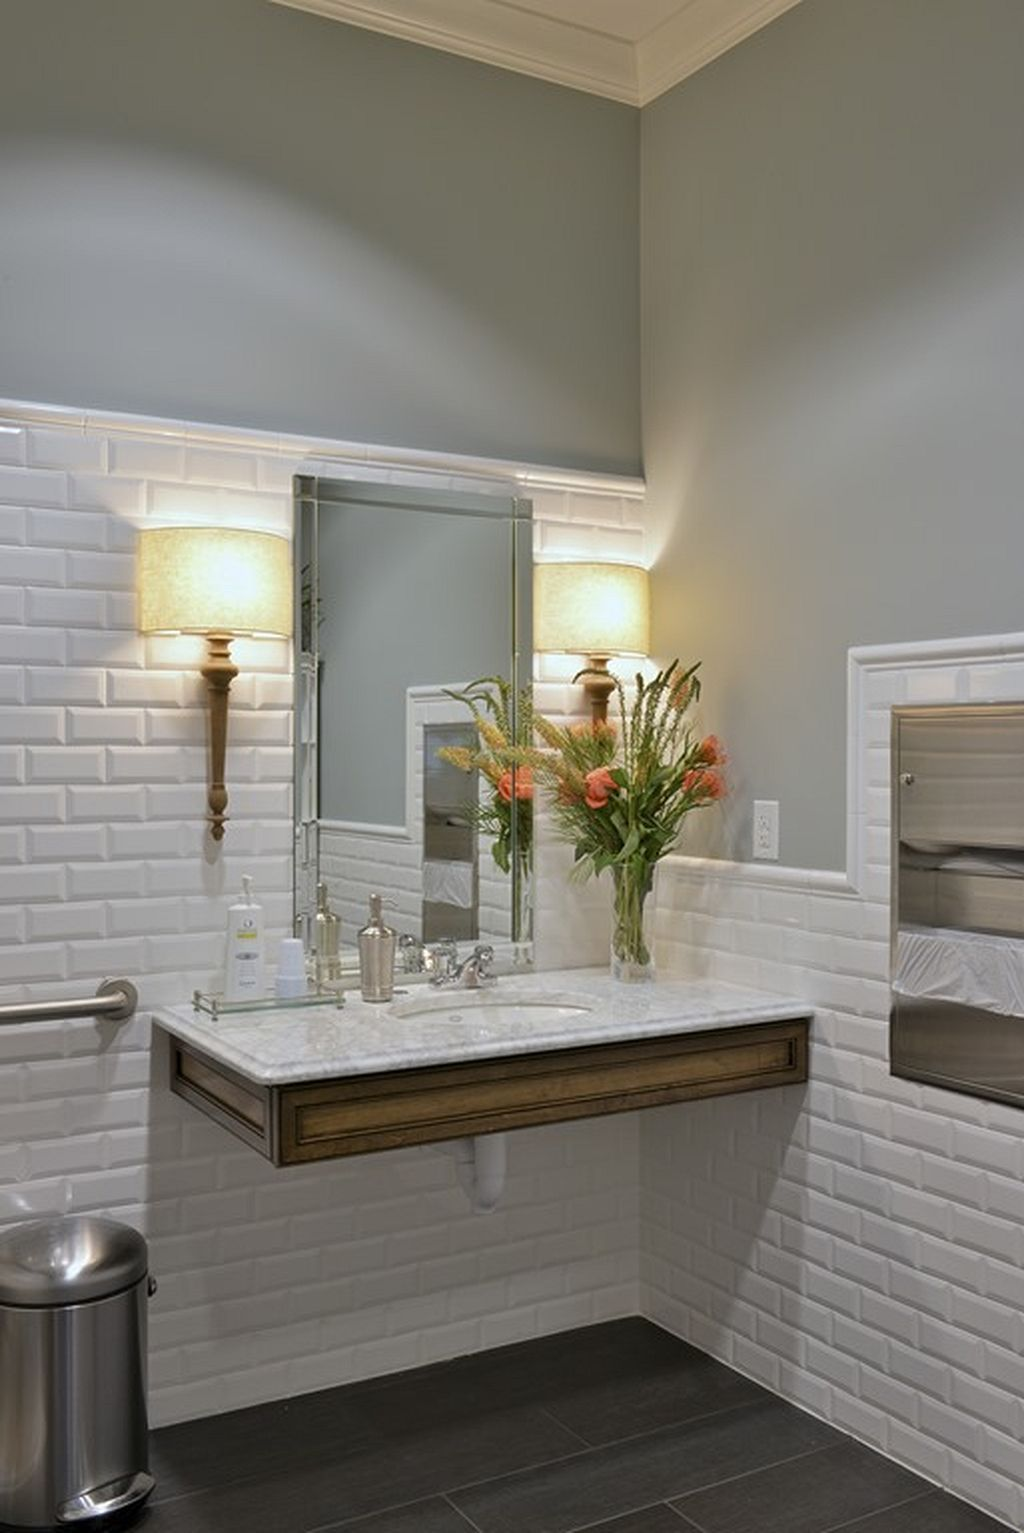 Office Bathroom Decorating Ideas In 2020 Office Bathroom Dental